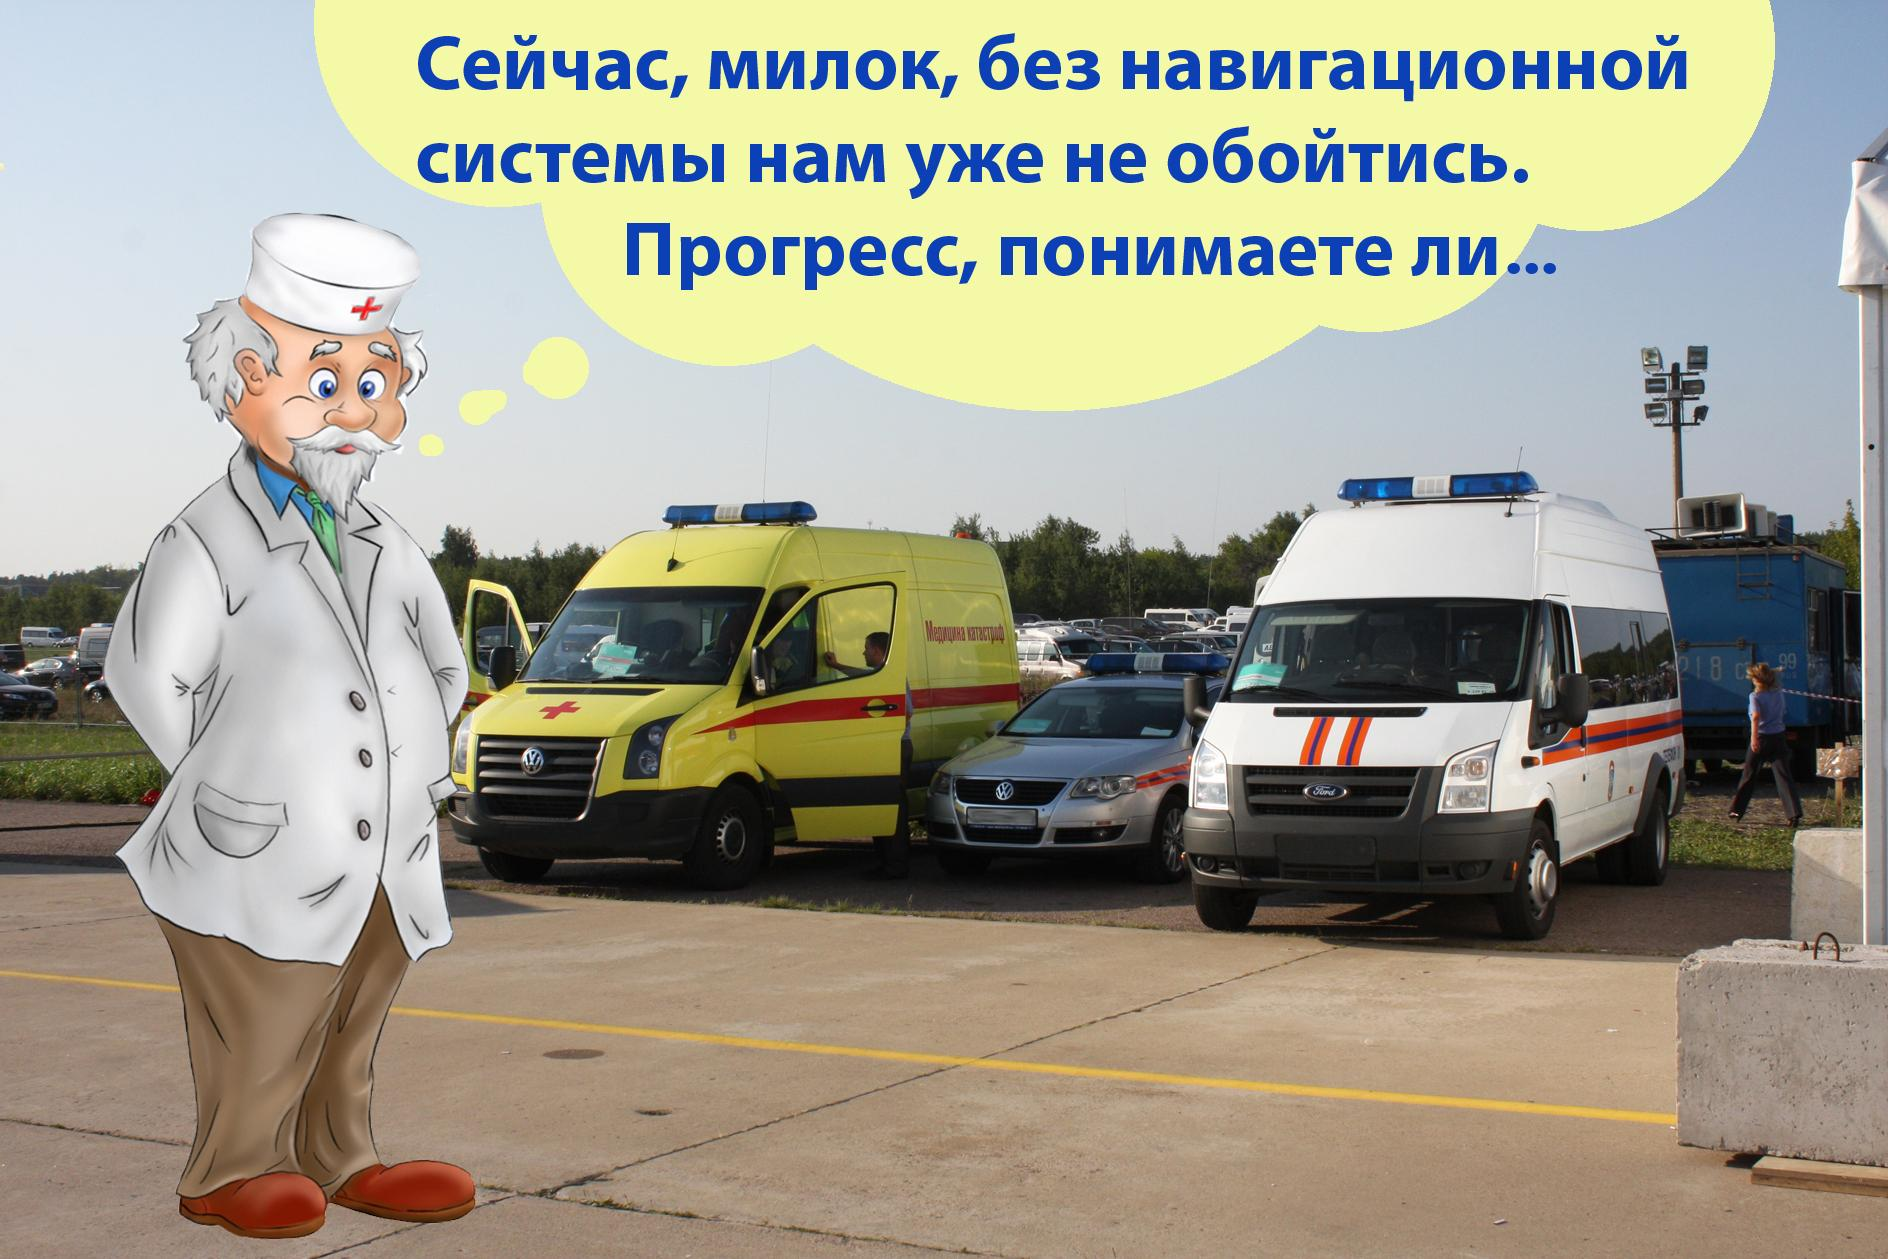 мониторинг скорой помощи